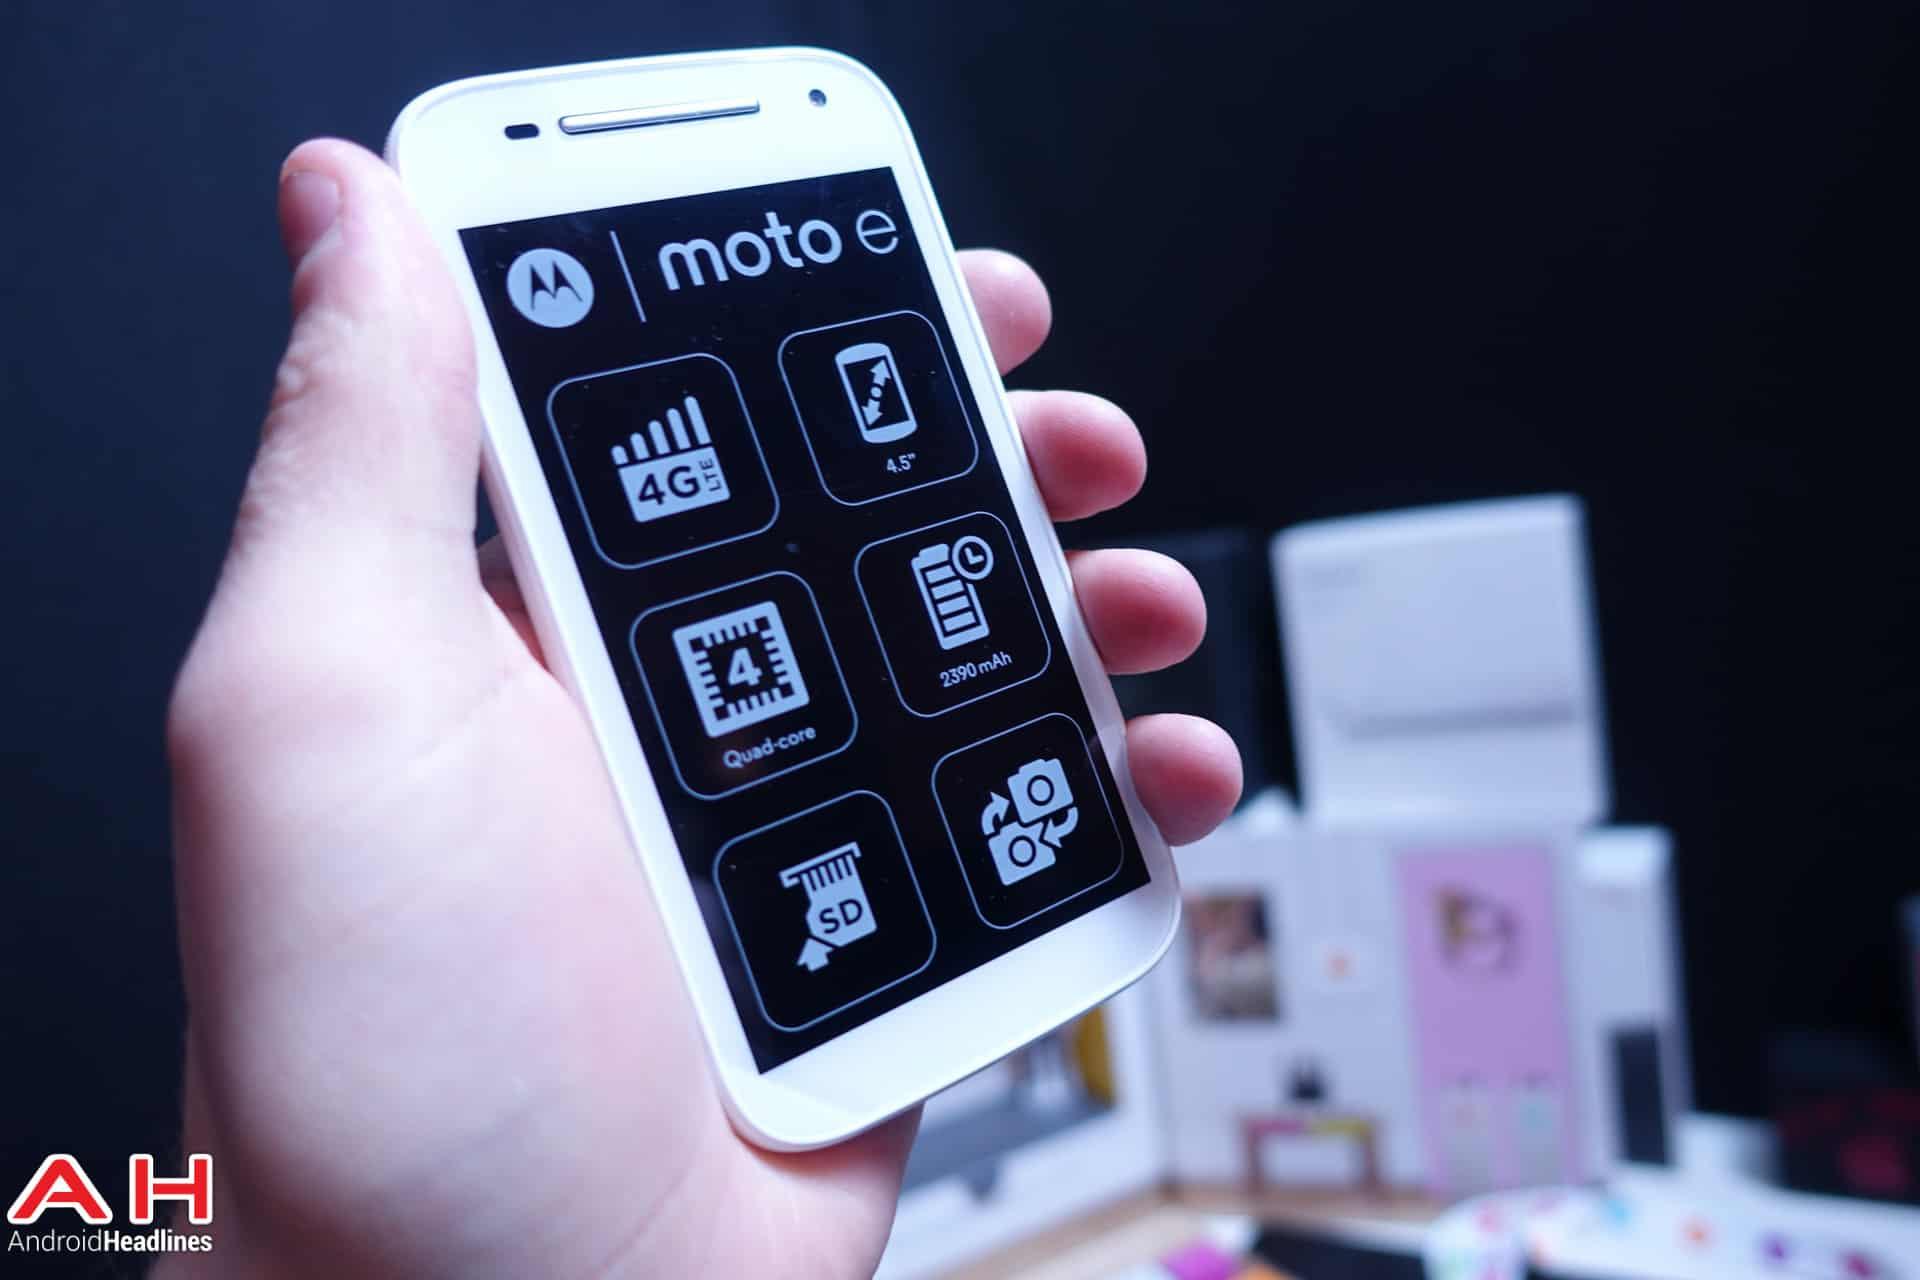 Moto E 4G LTE AH 03952